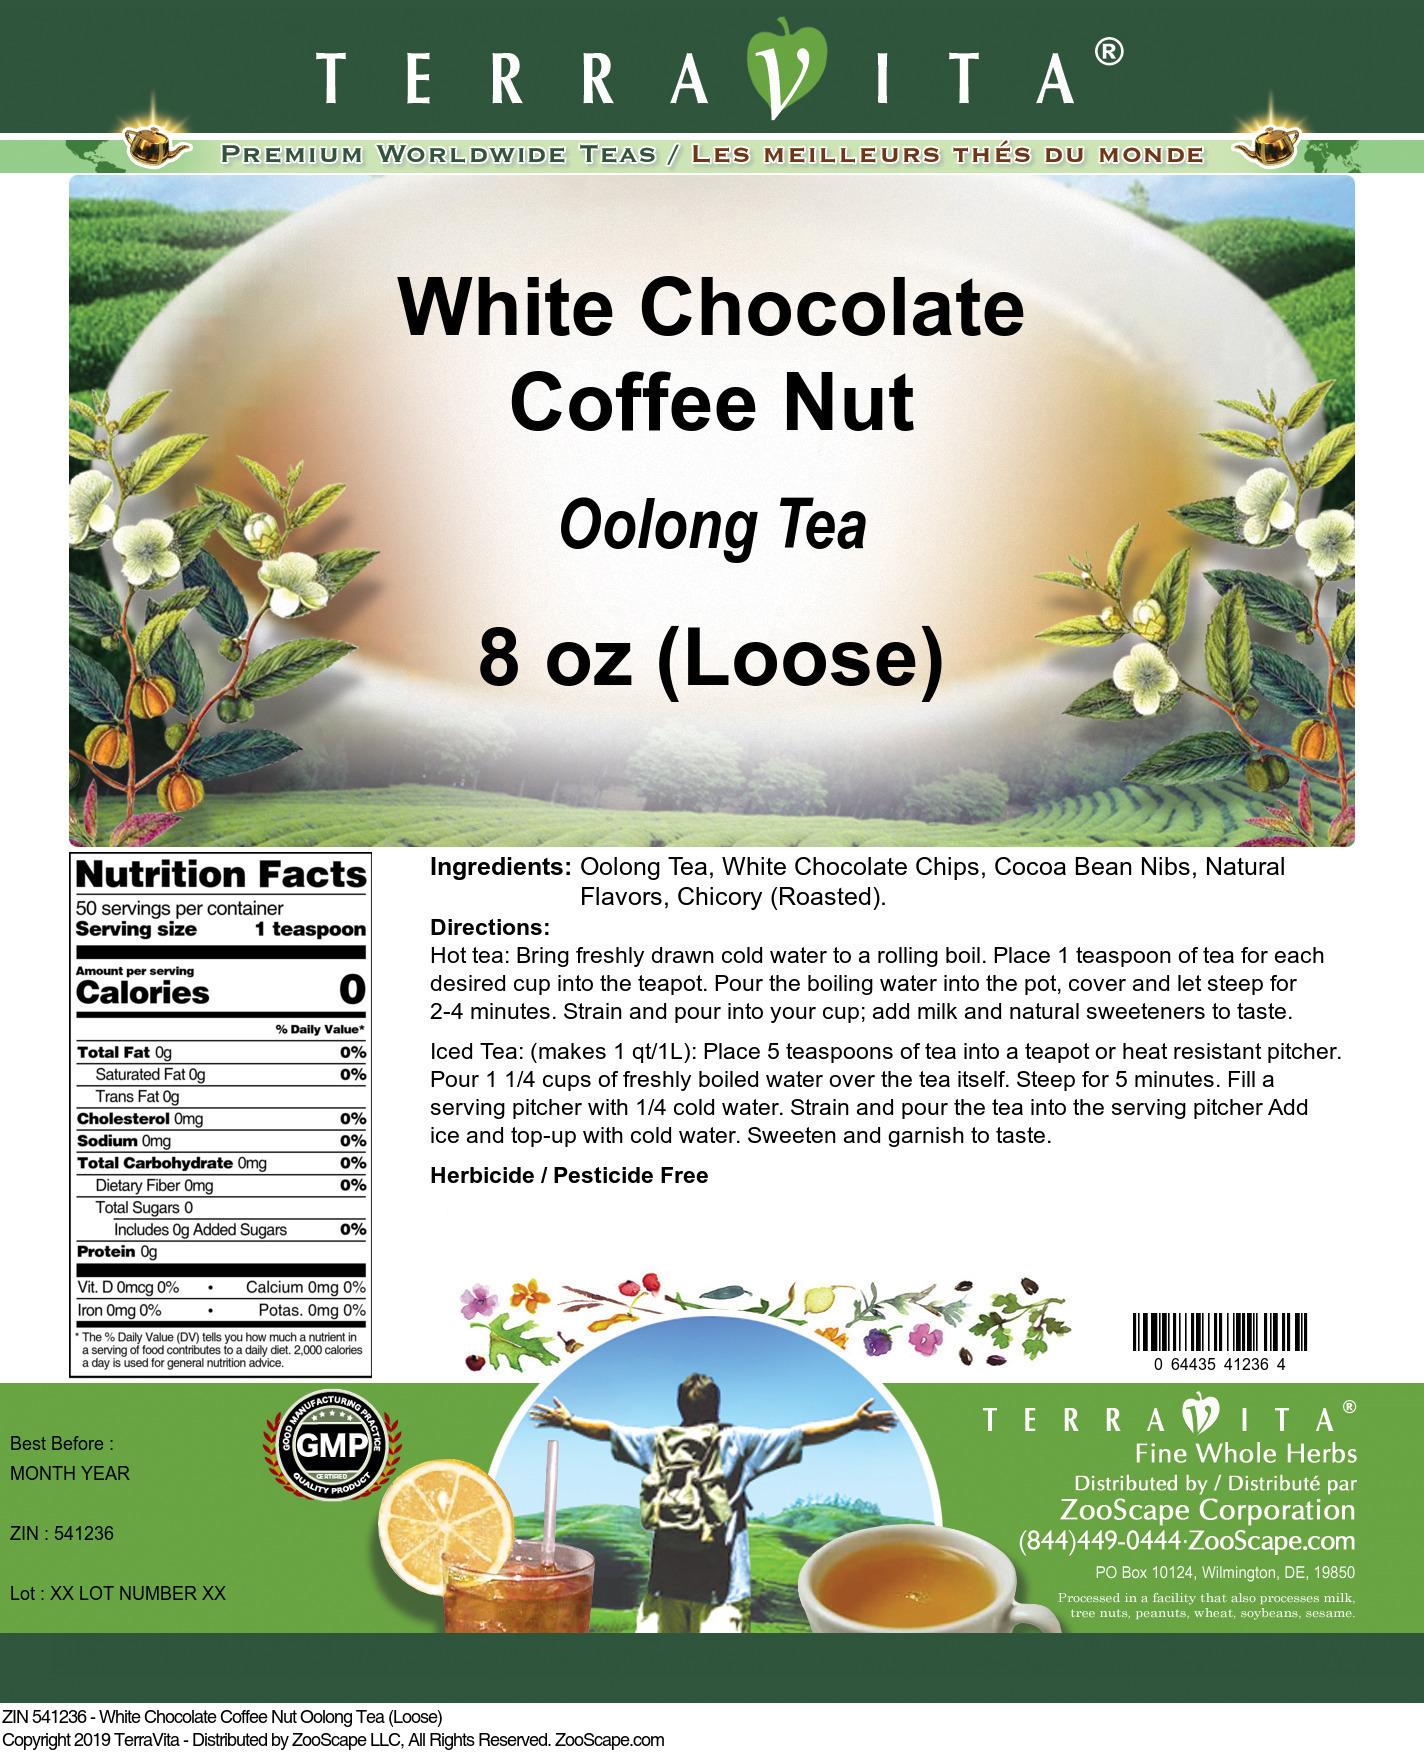 White Chocolate Coffee Nut Oolong Tea (Loose)